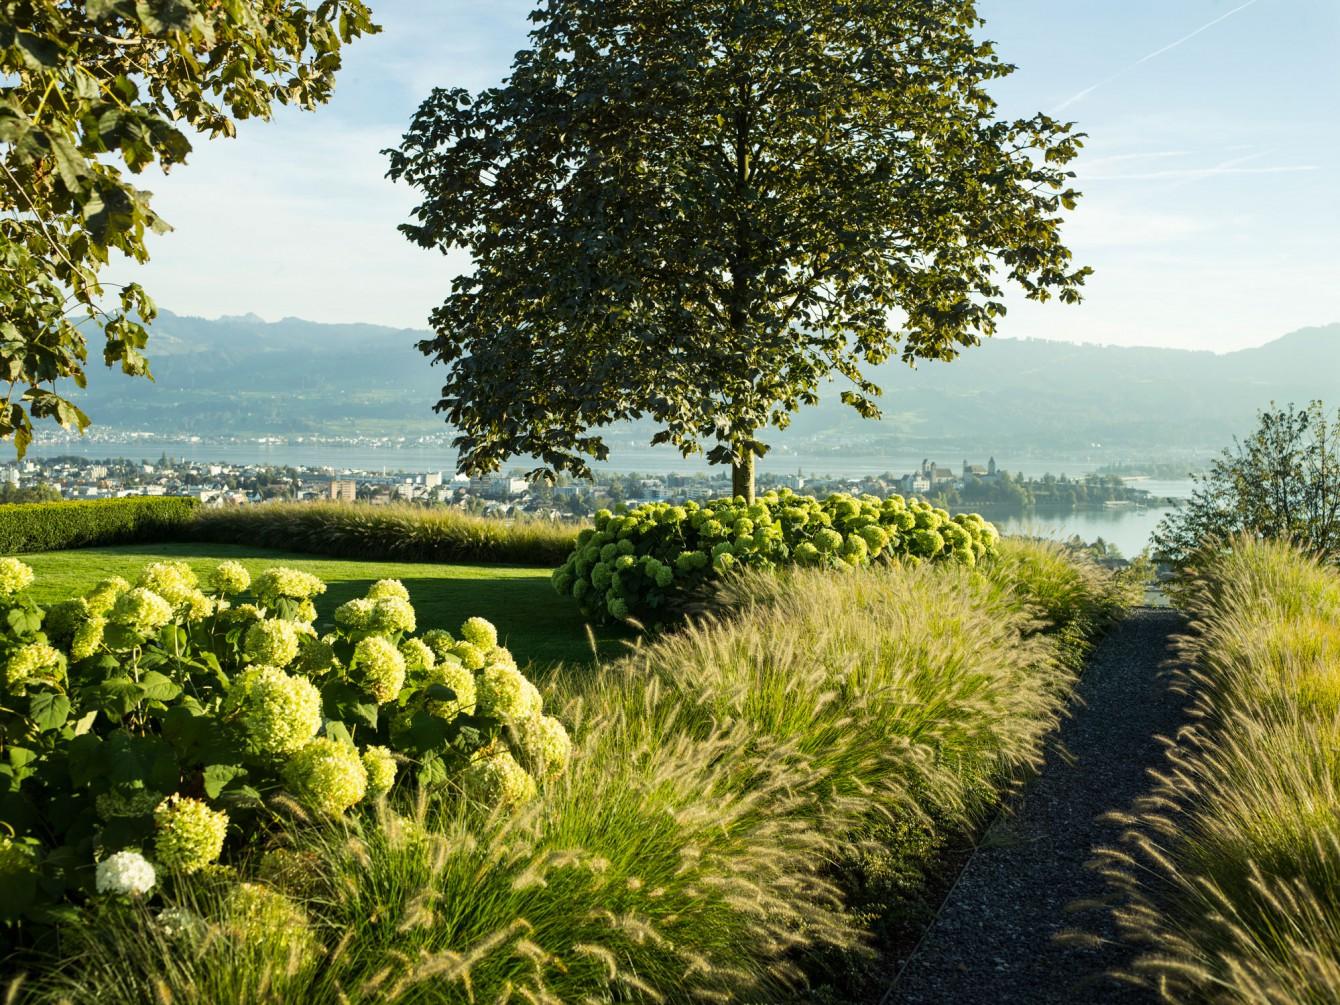 Enea Landscape Zurich